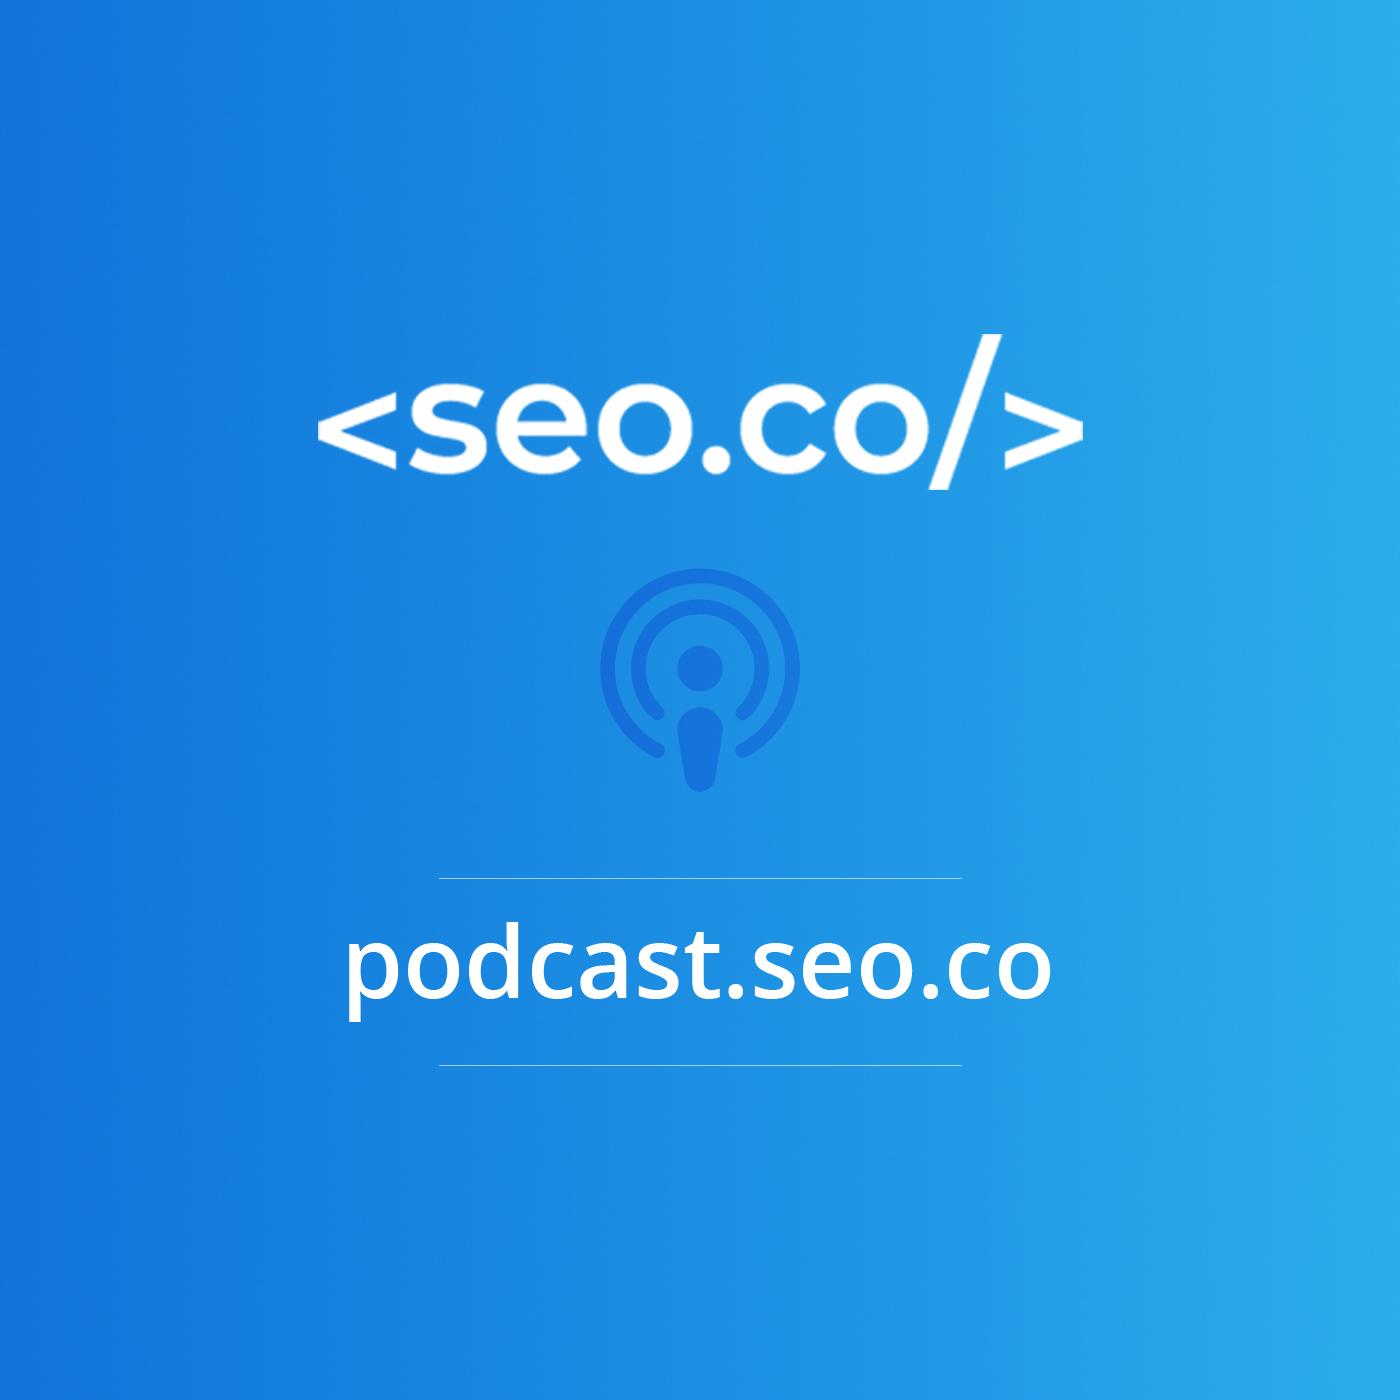 SEO Podcast   SEO.co Search Engine Optimization Podcast show art